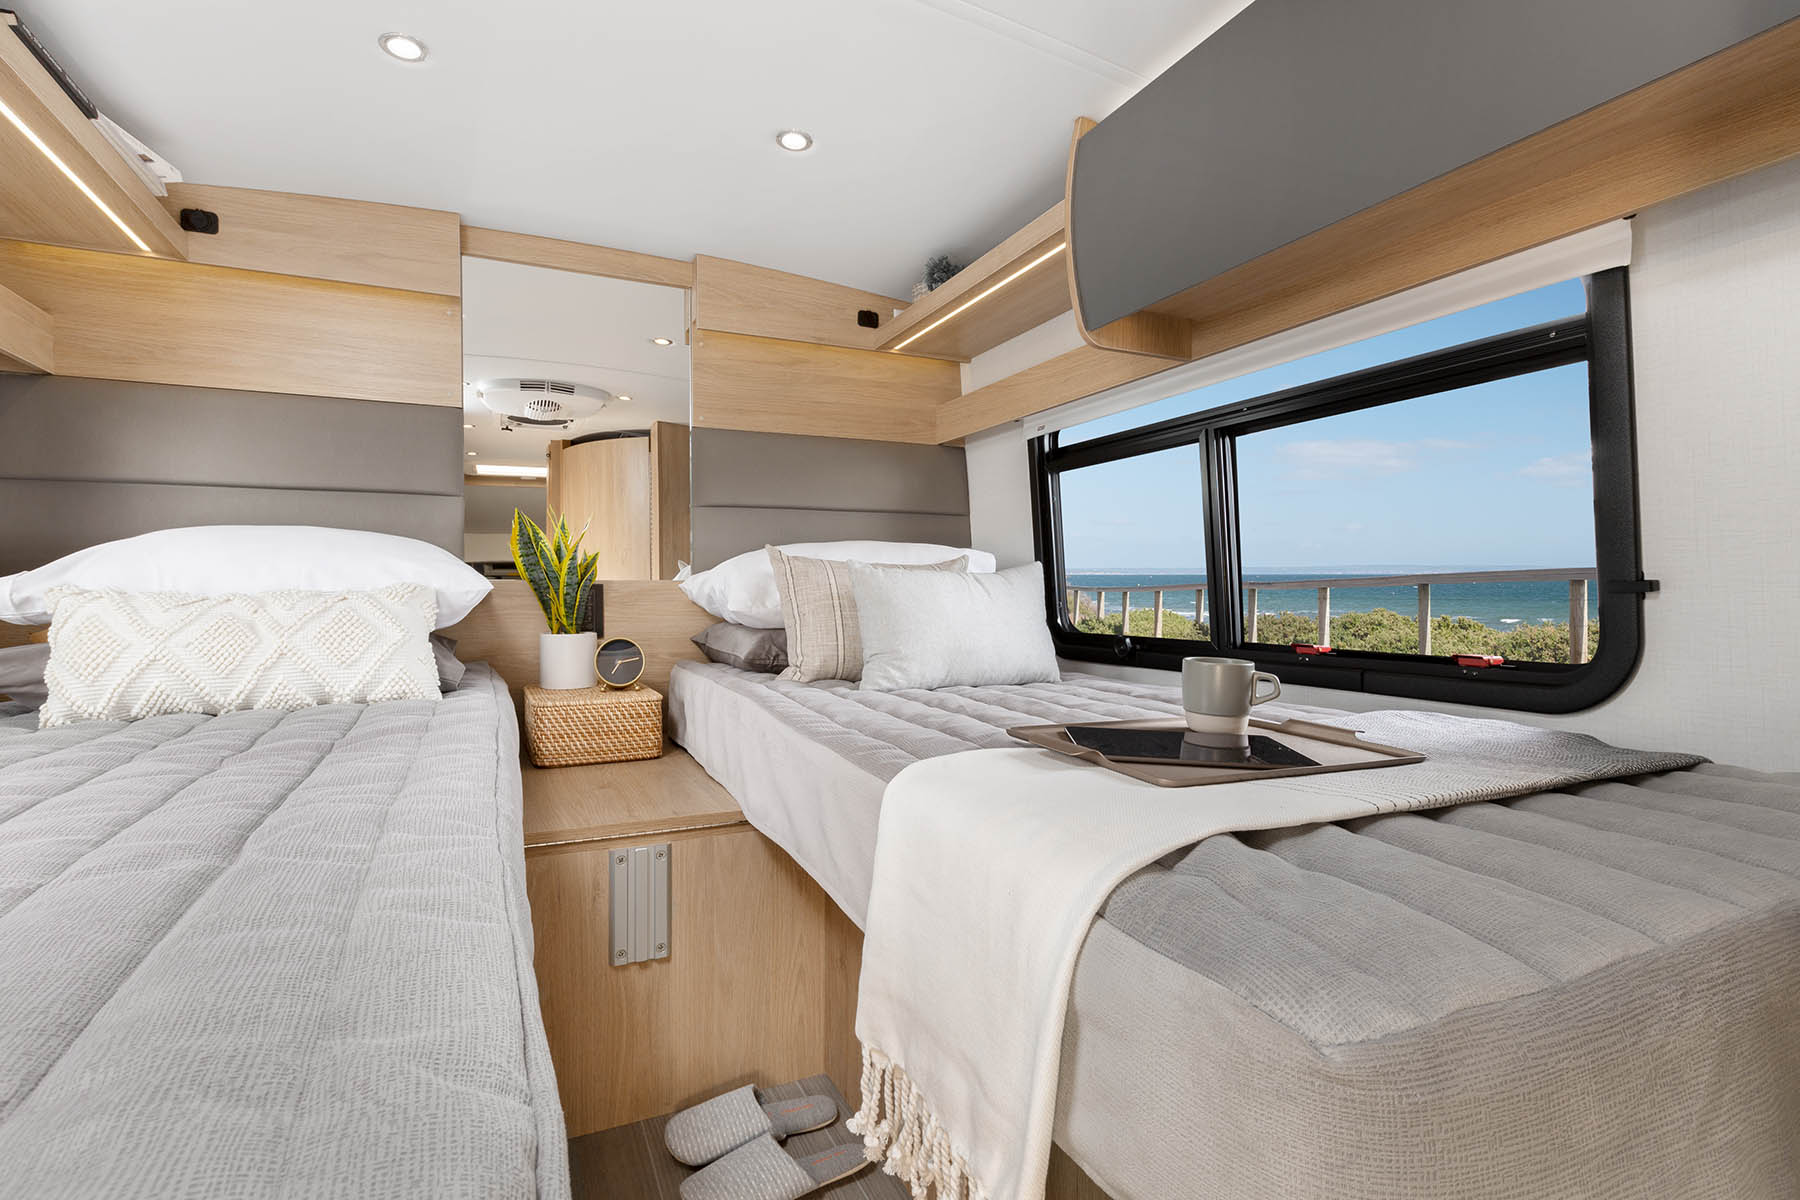 Rear Twin Beds